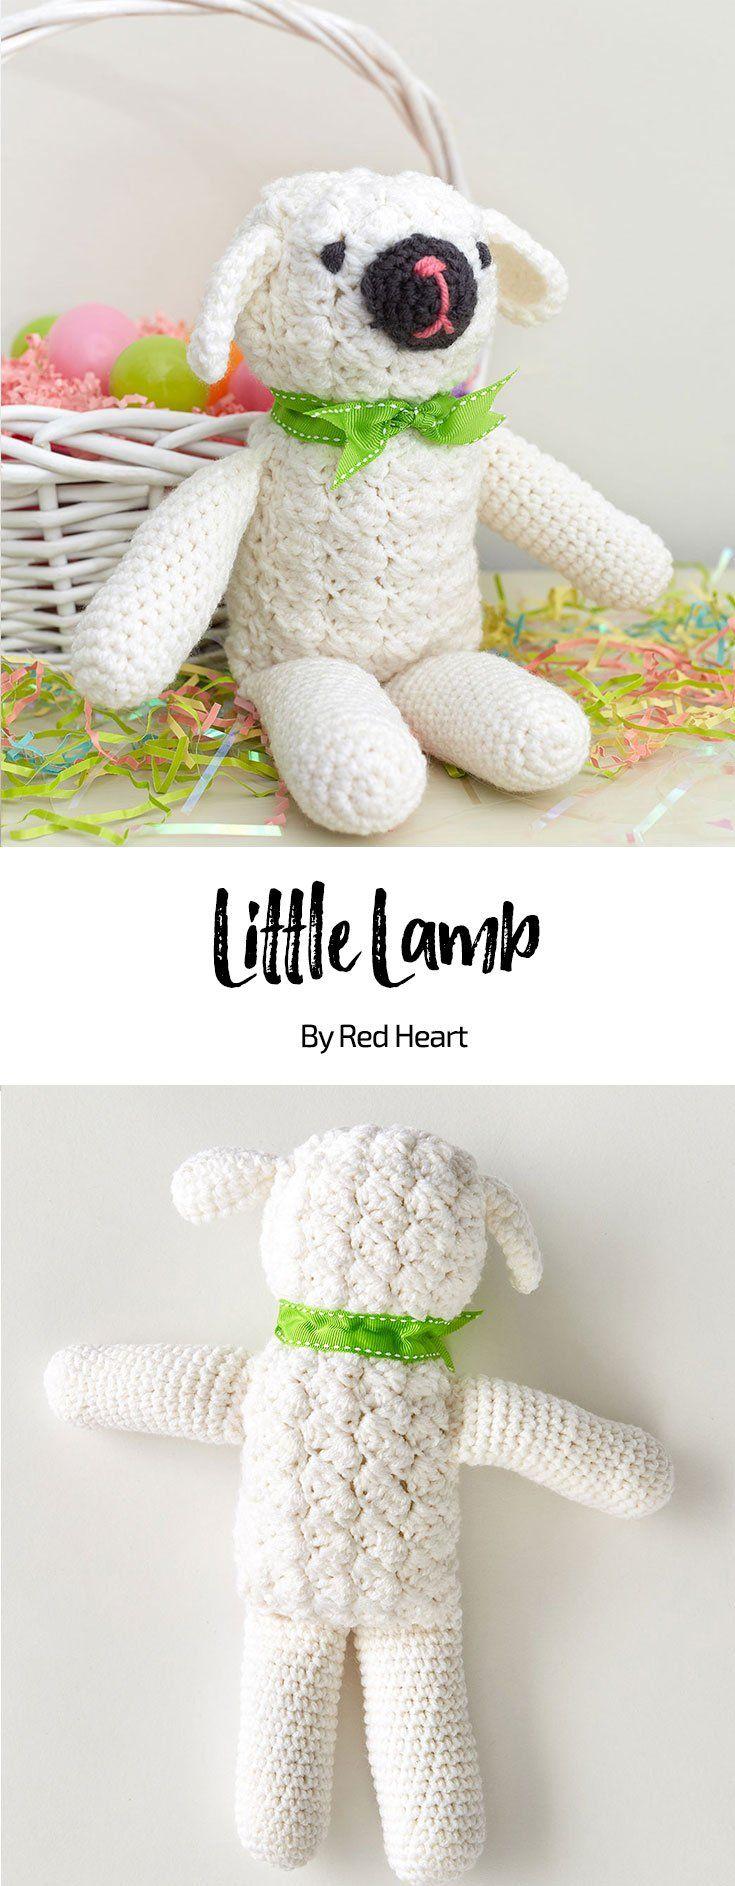 Little Lamb free crochet pattern in With Love yarn. | tiffie-may ...